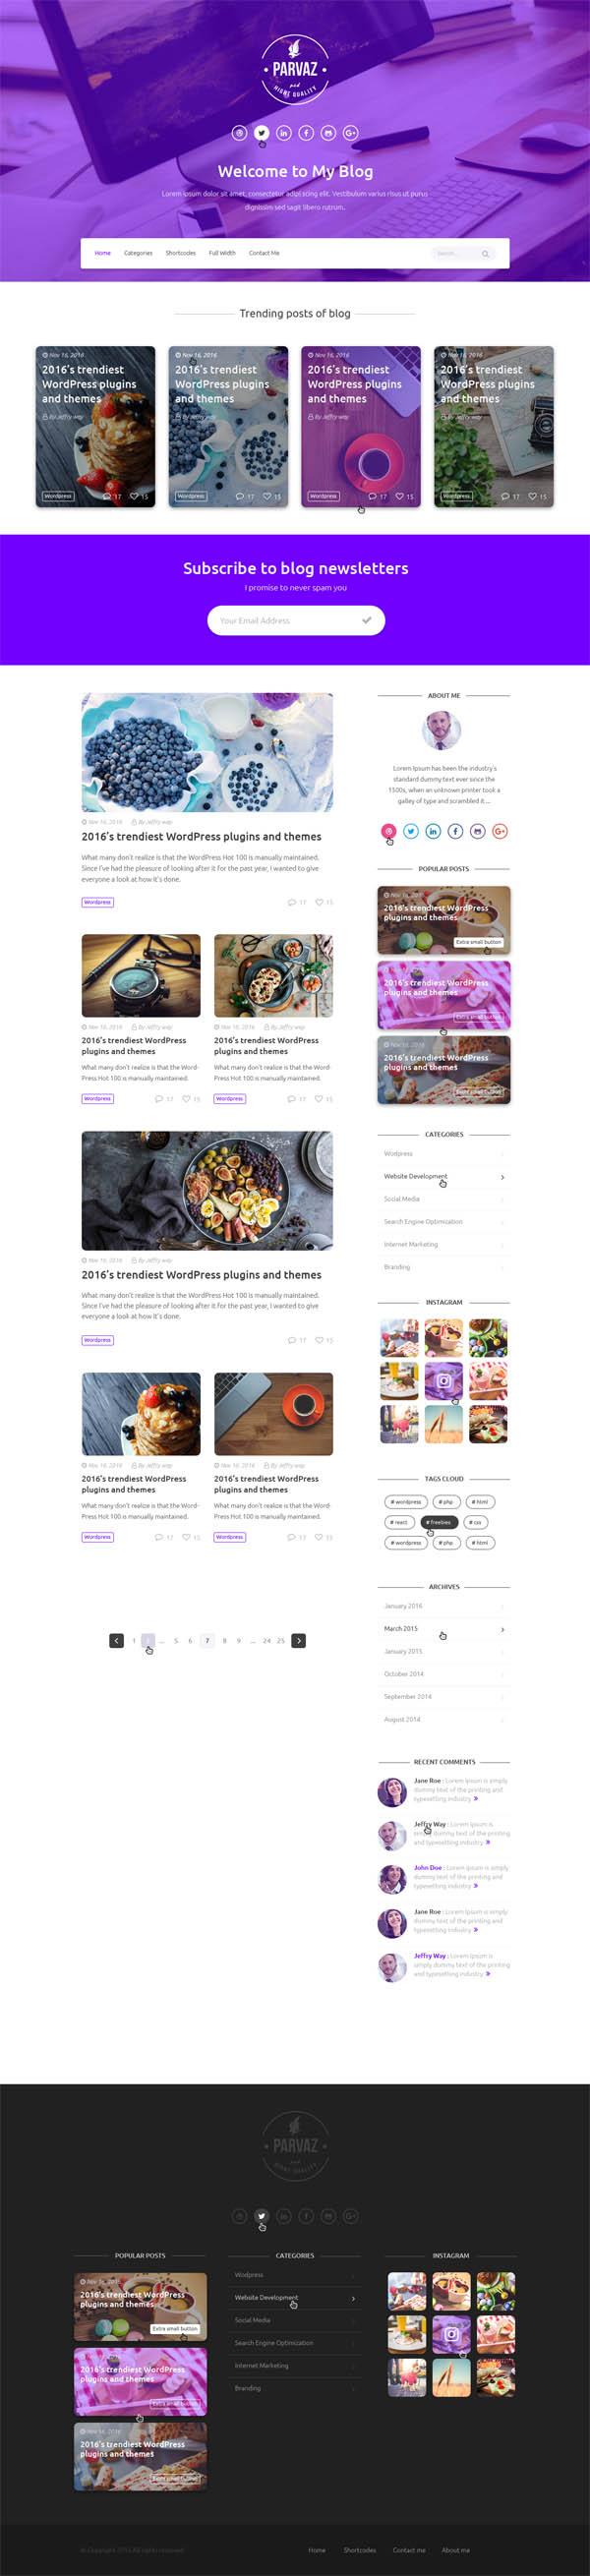 Parvaz - Personal Blogging PSD Template